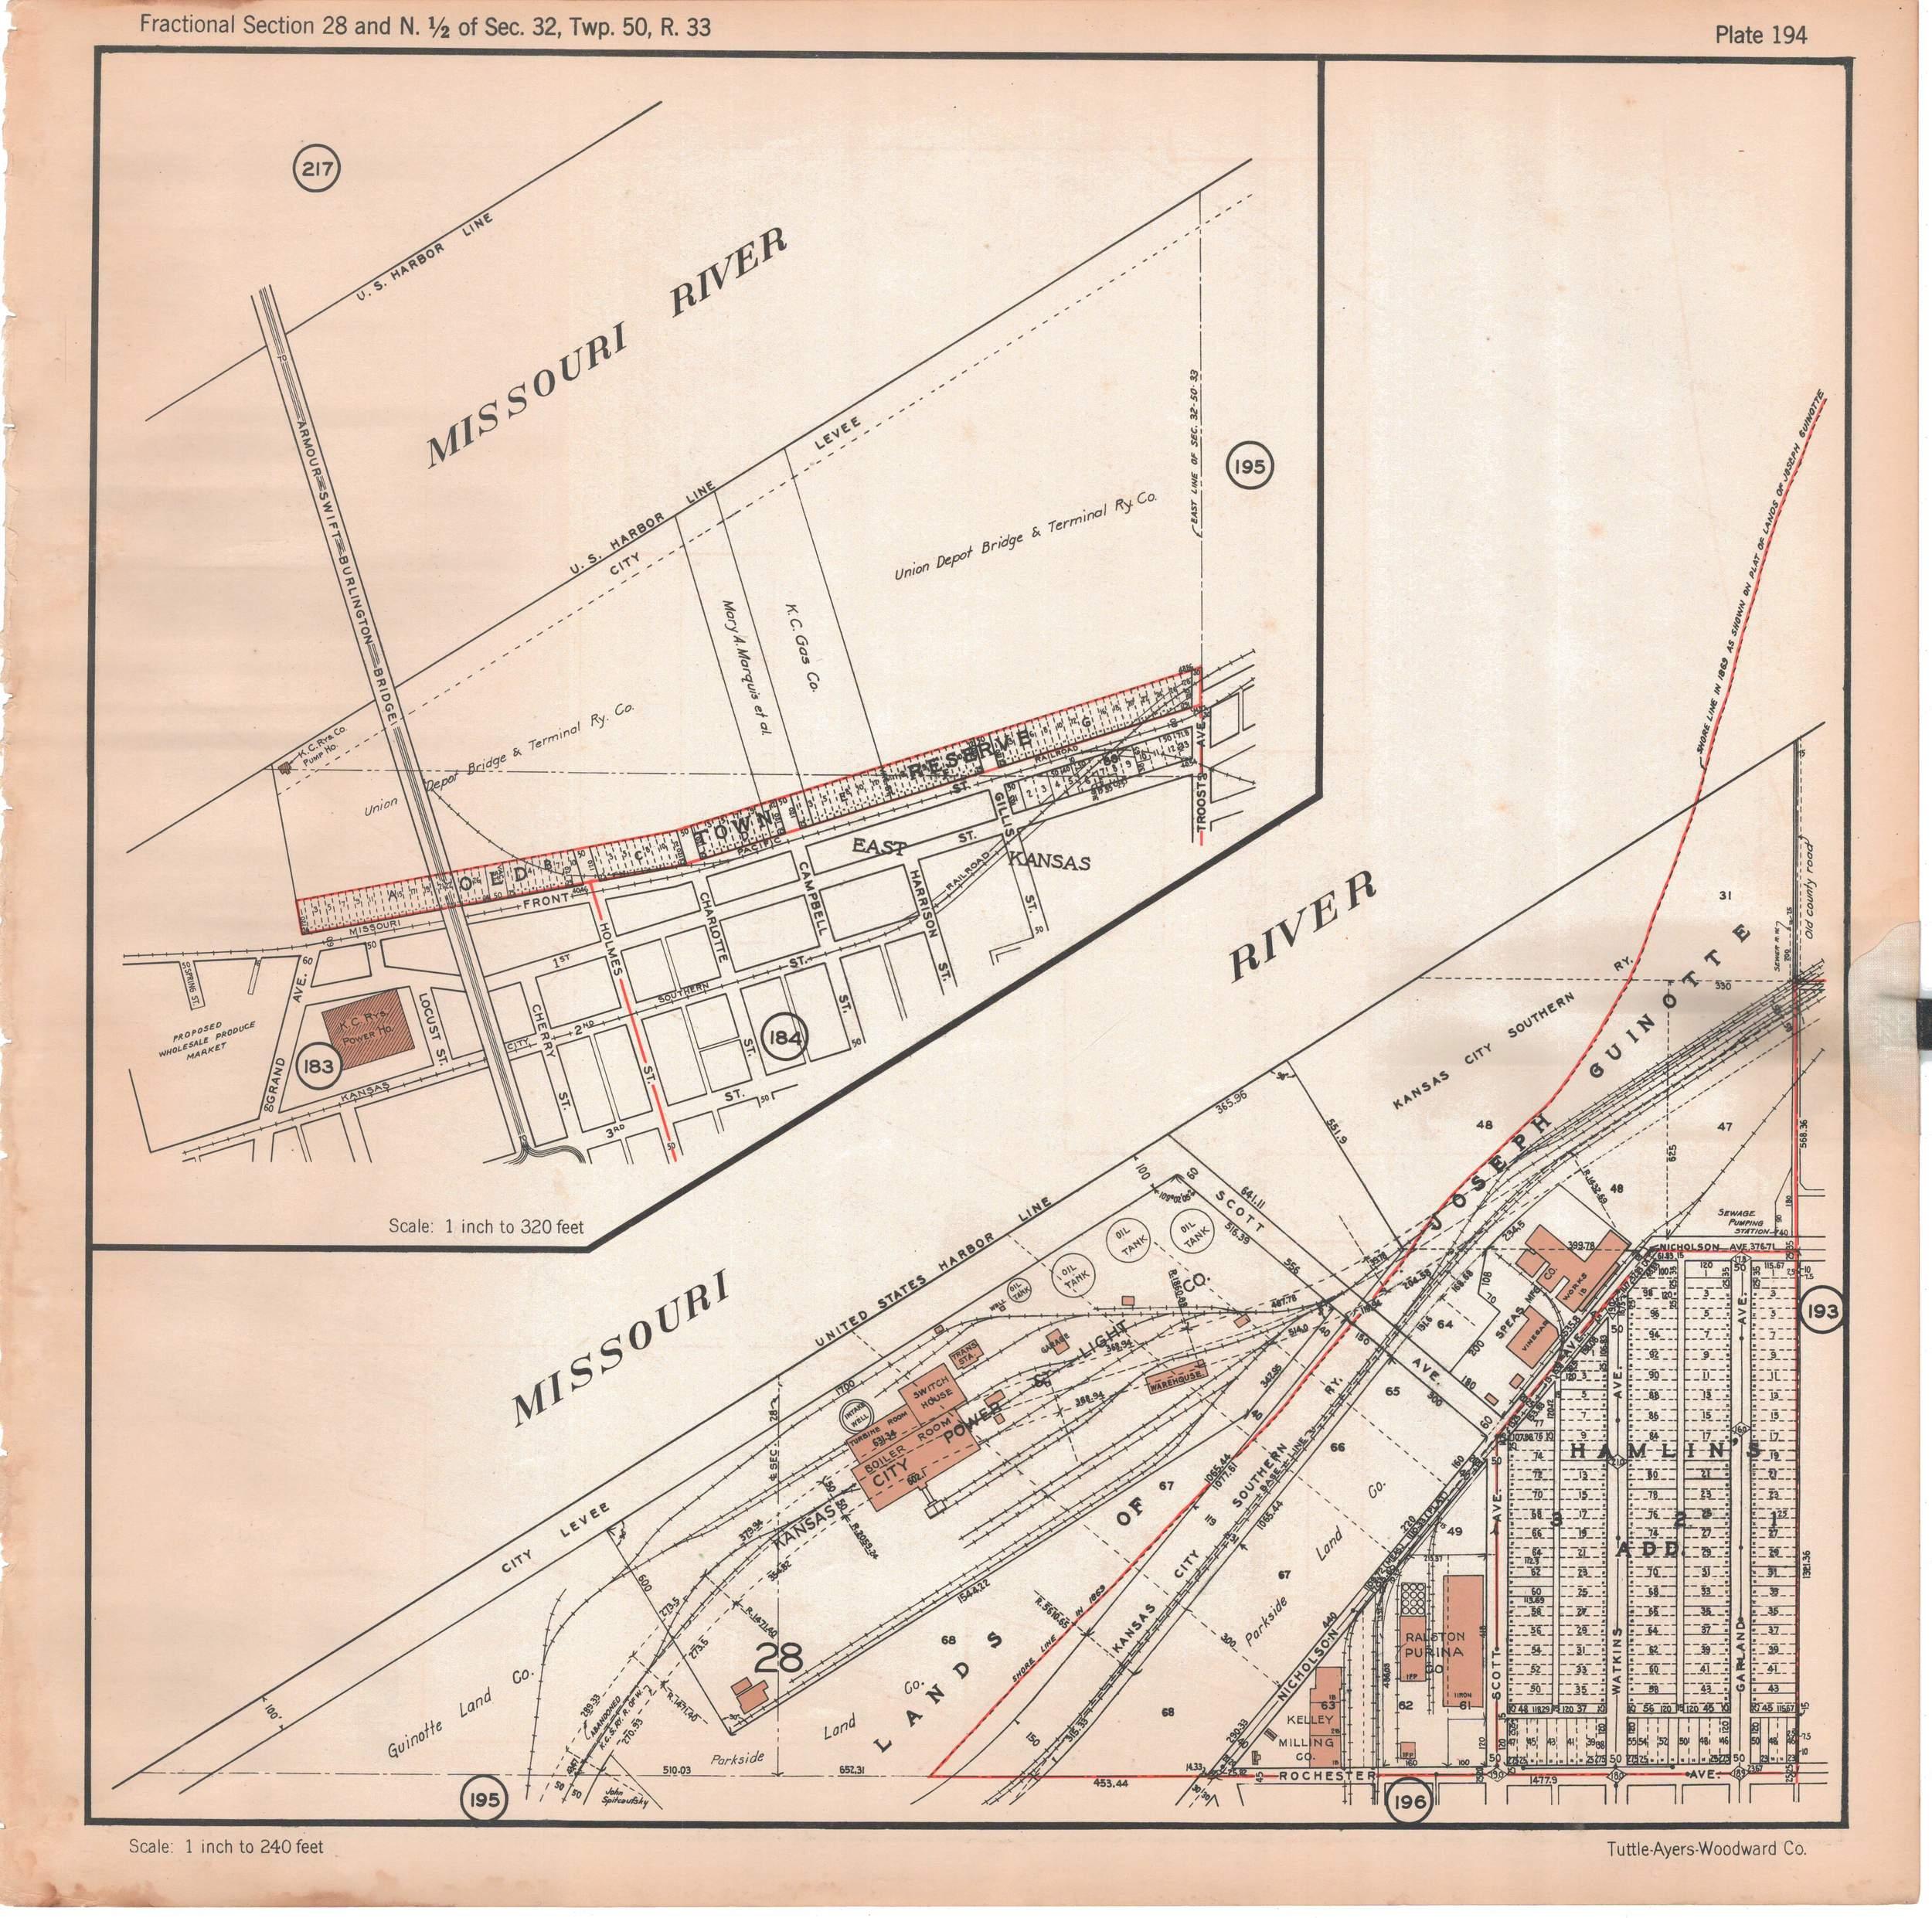 1925 TUTTLE_AYERS_Plate_194.JPG